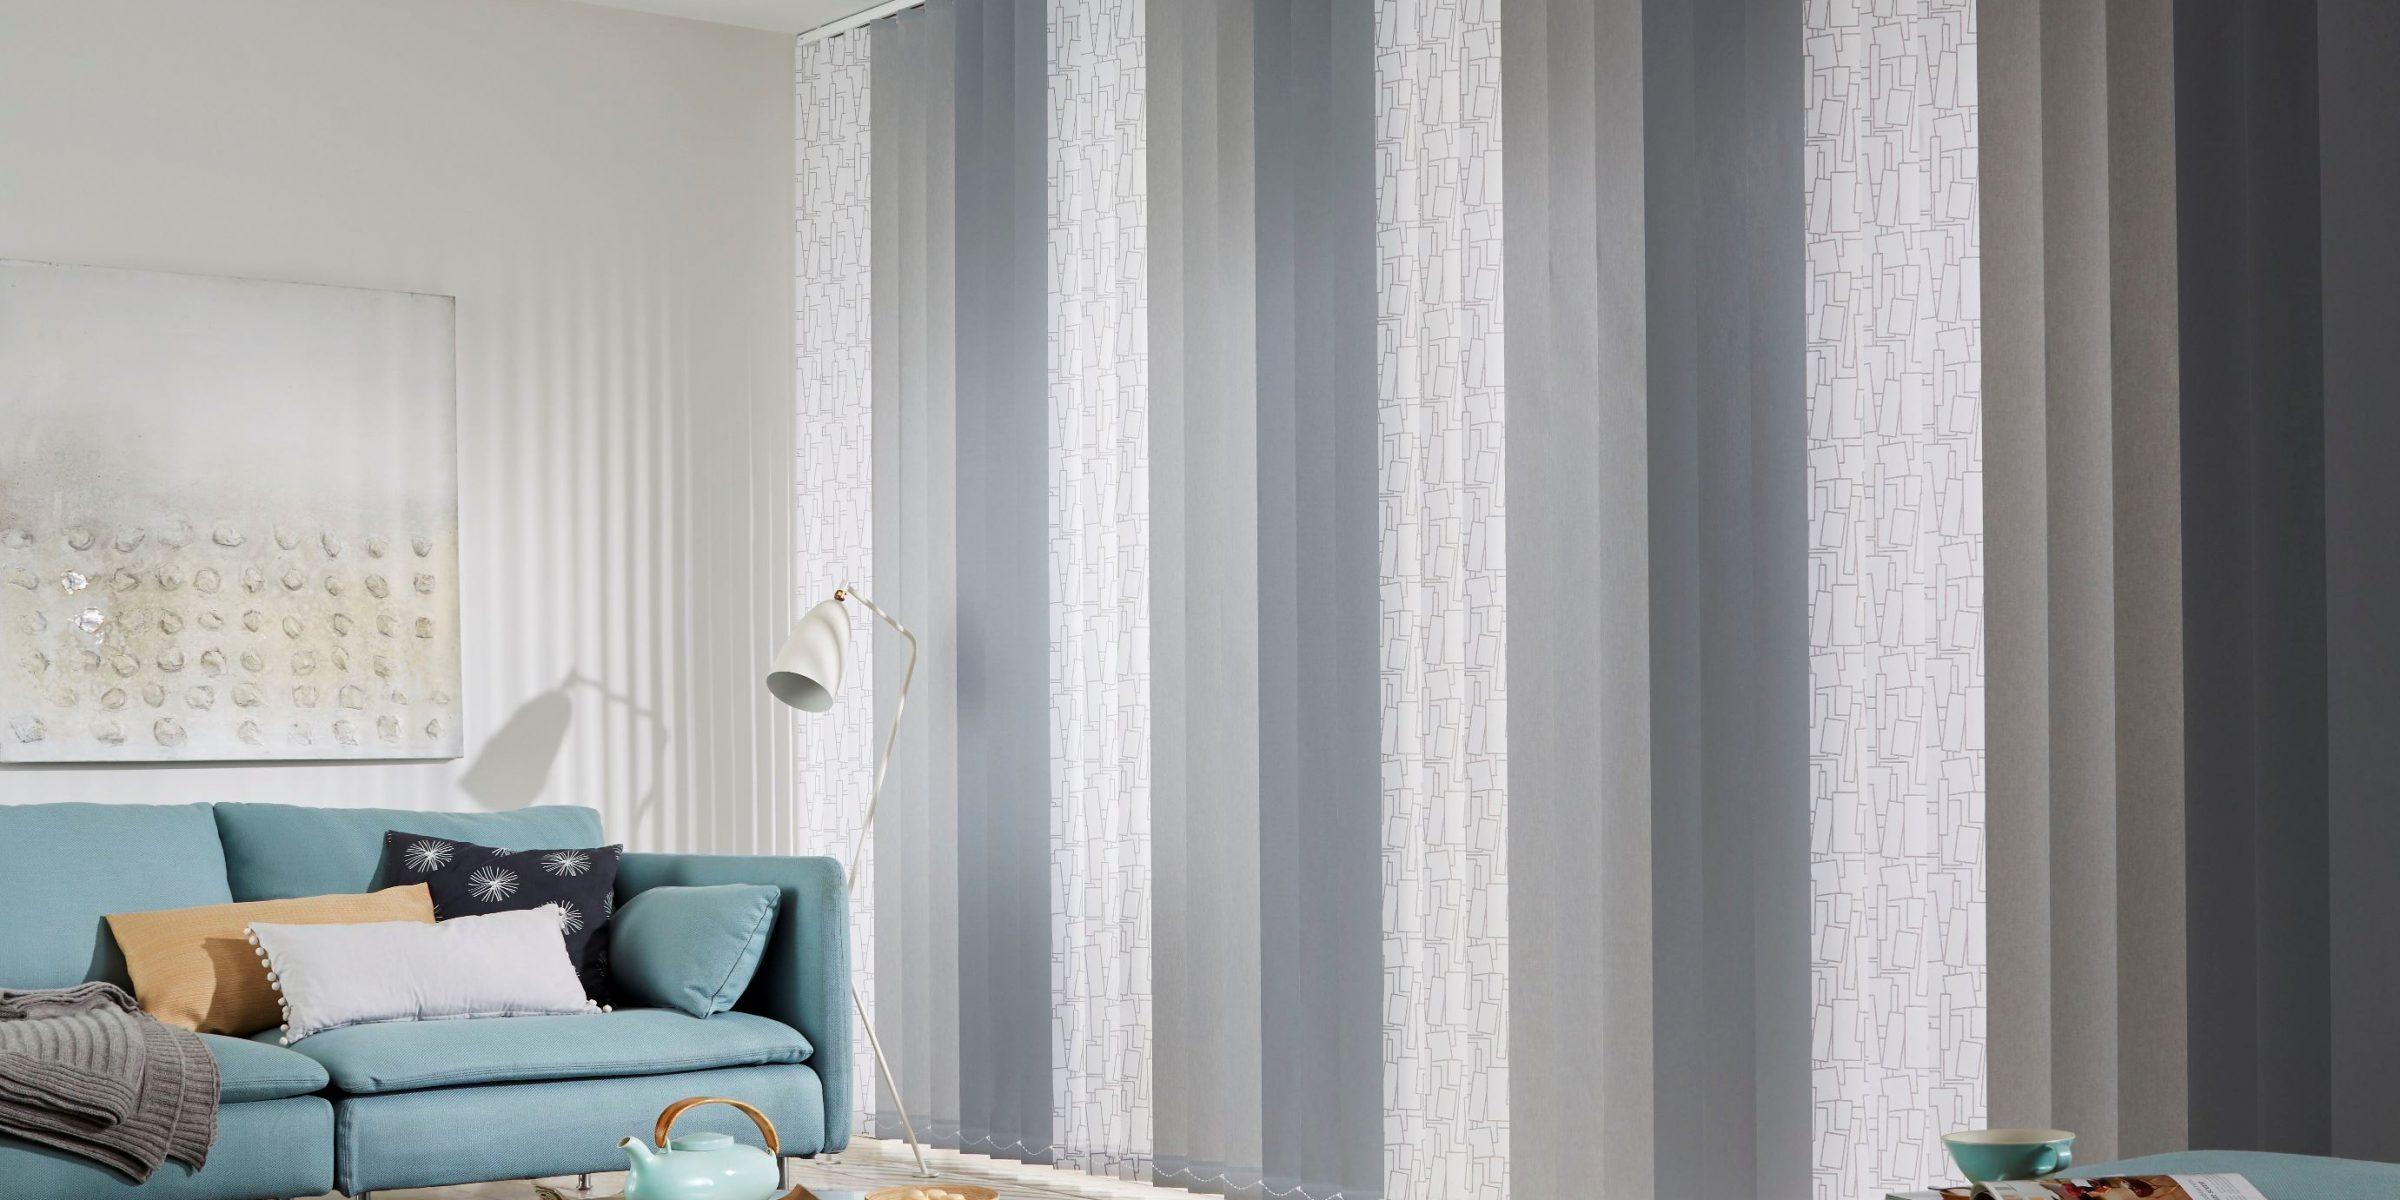 lamellen rollo affordable innen gardinen jalousien with. Black Bedroom Furniture Sets. Home Design Ideas